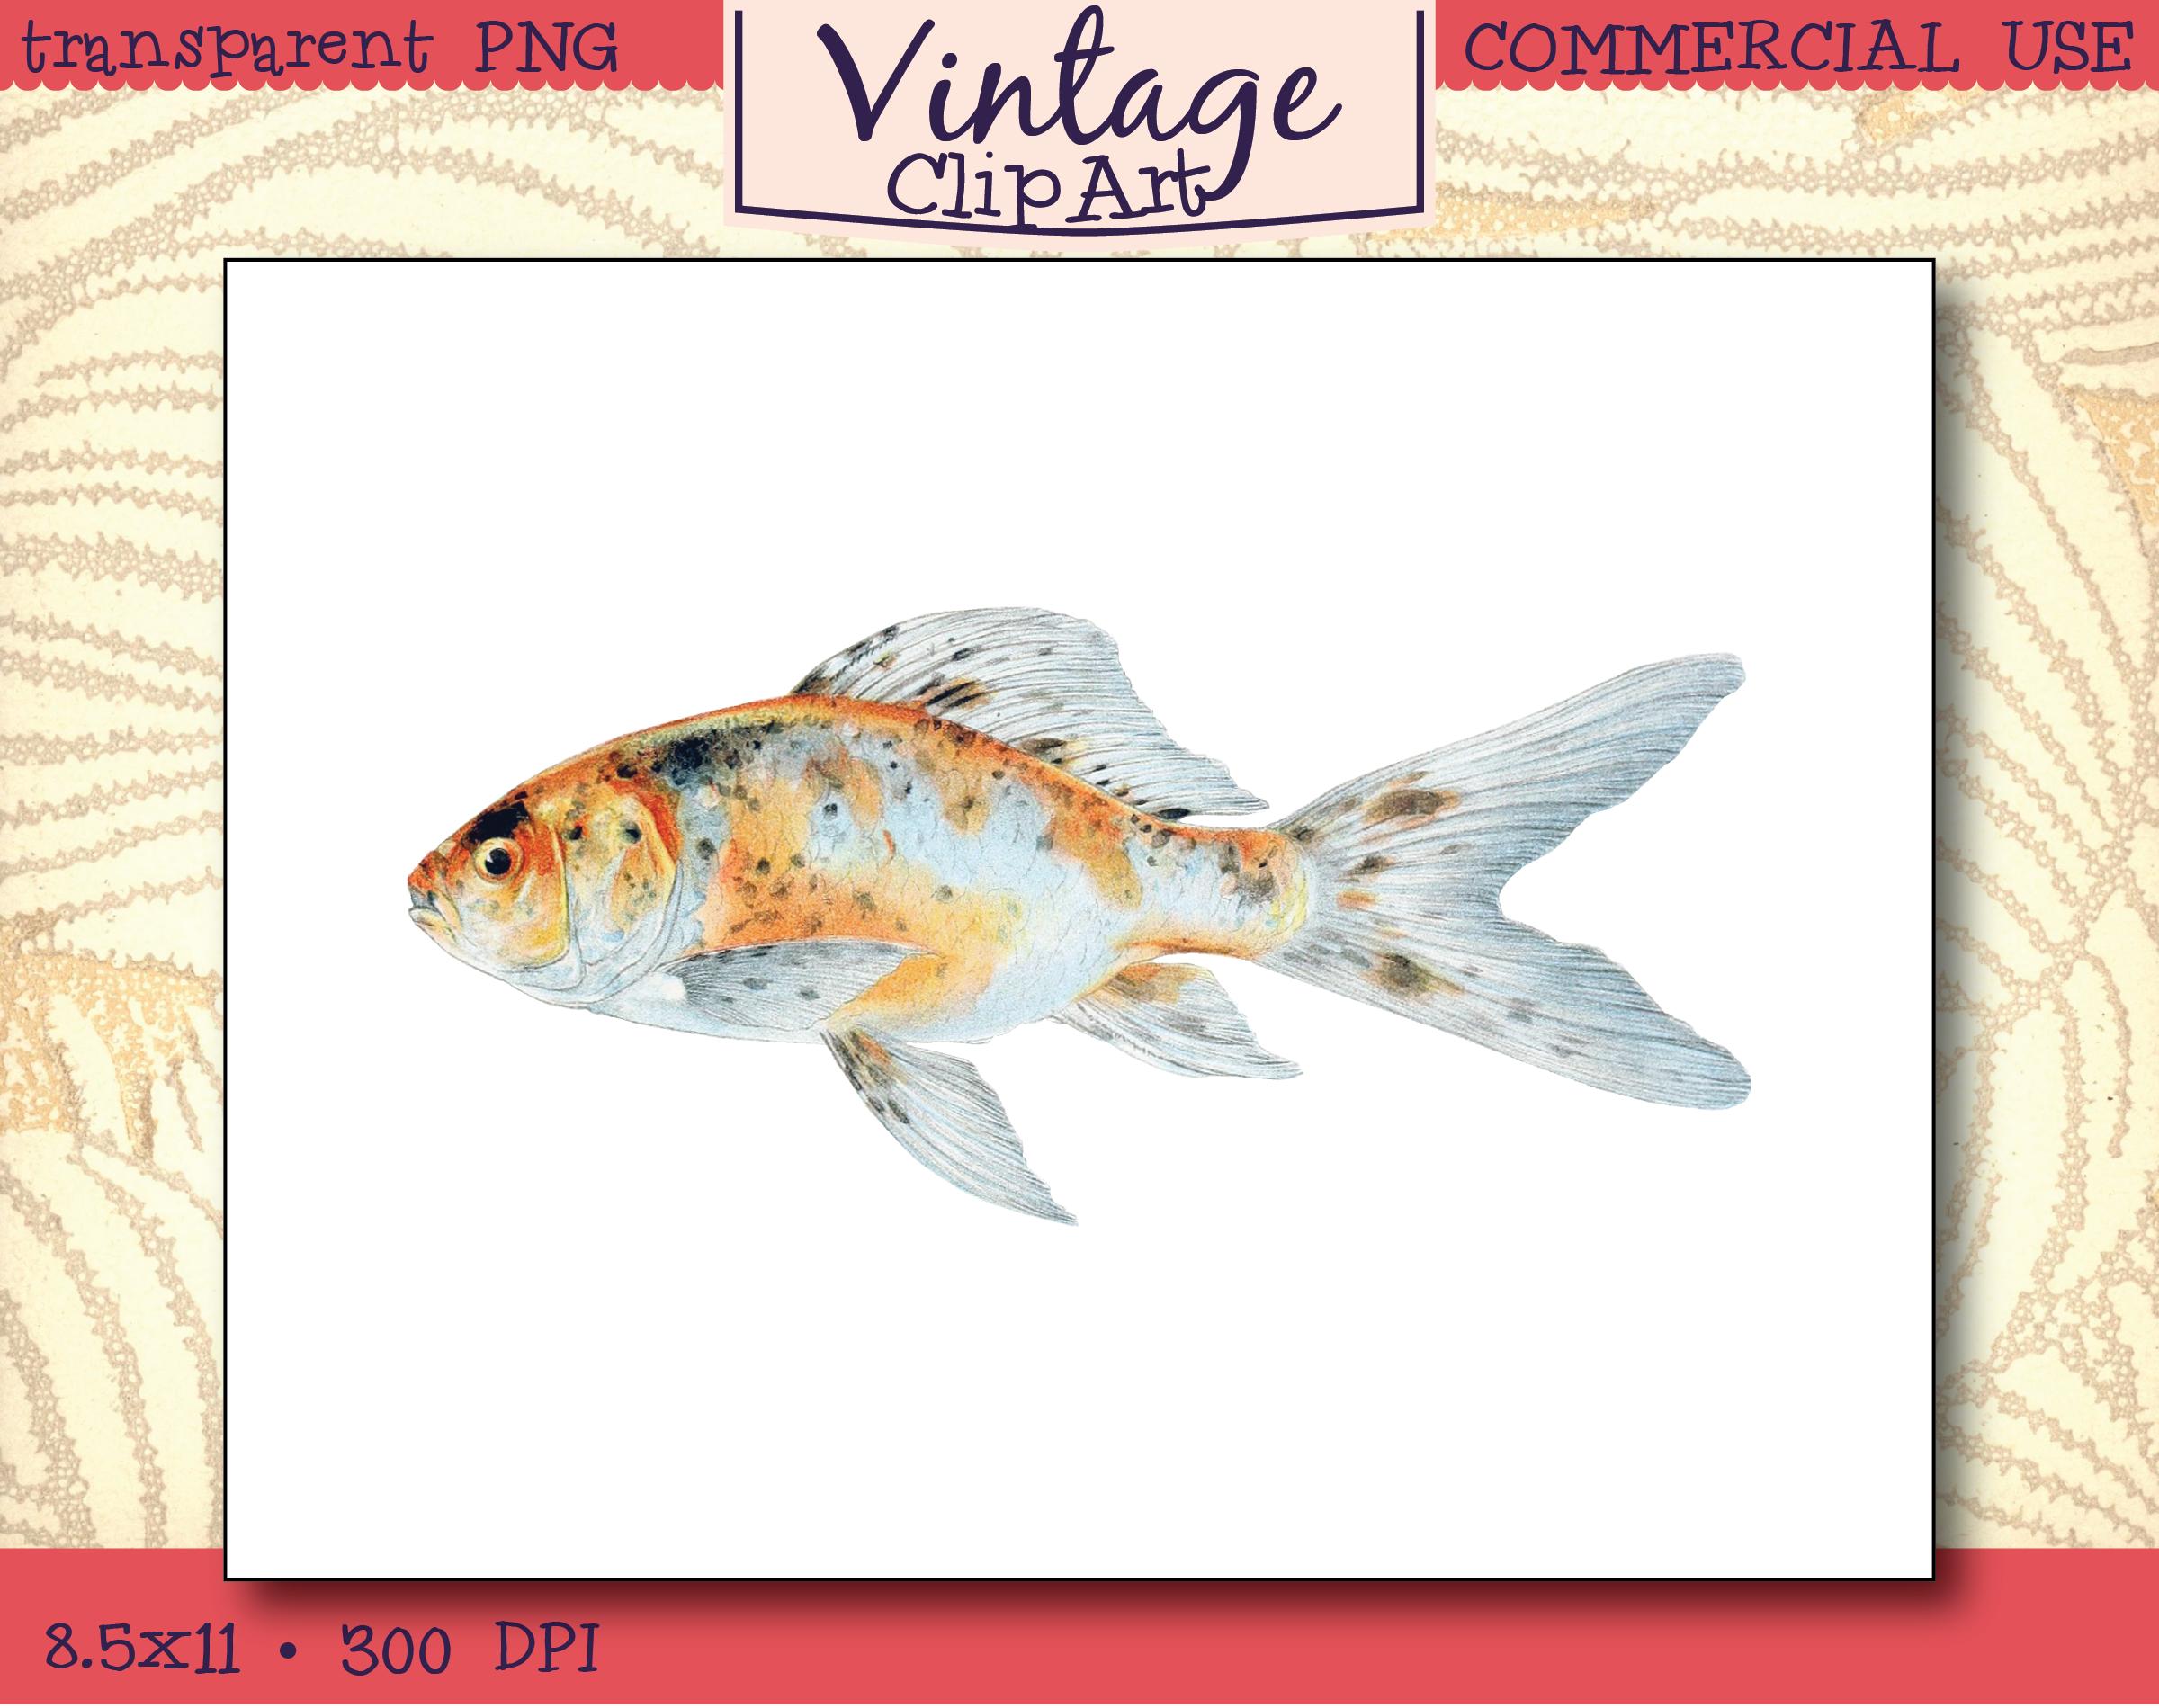 Vintage Fish Clipart – The Shubunkin-Speckled Goldfish – Instant Download